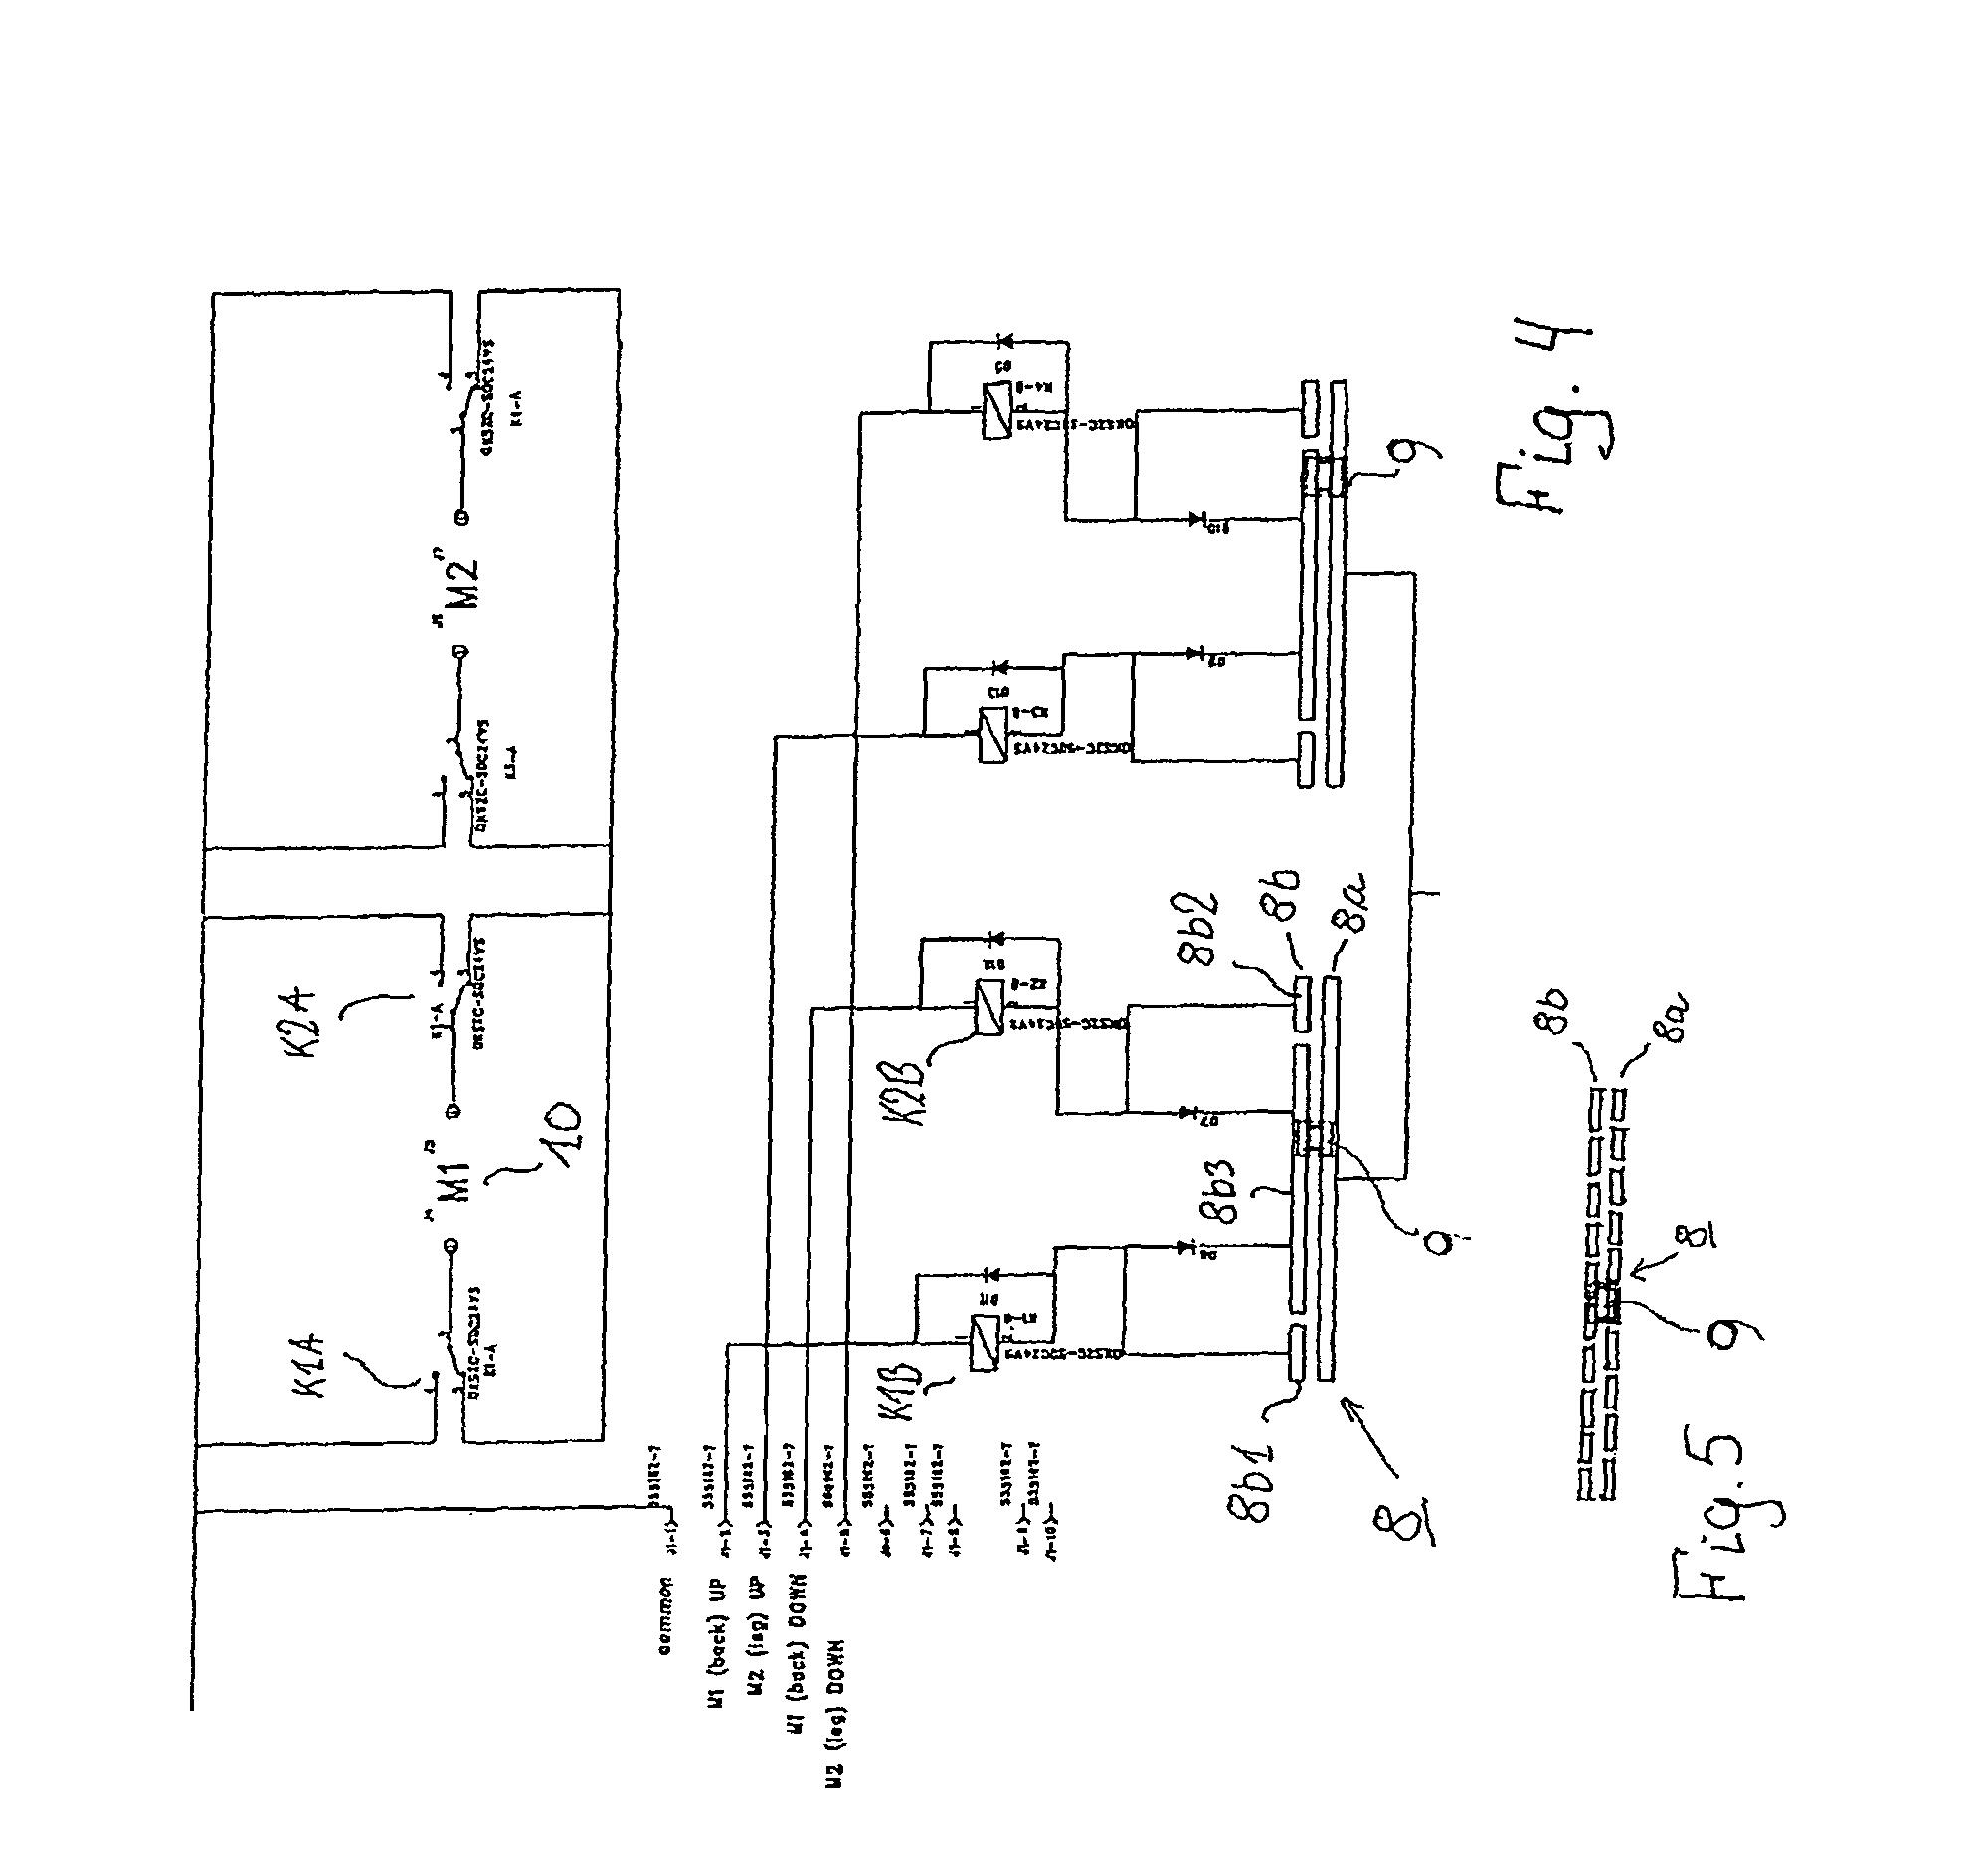 linak actuator wiring diagram